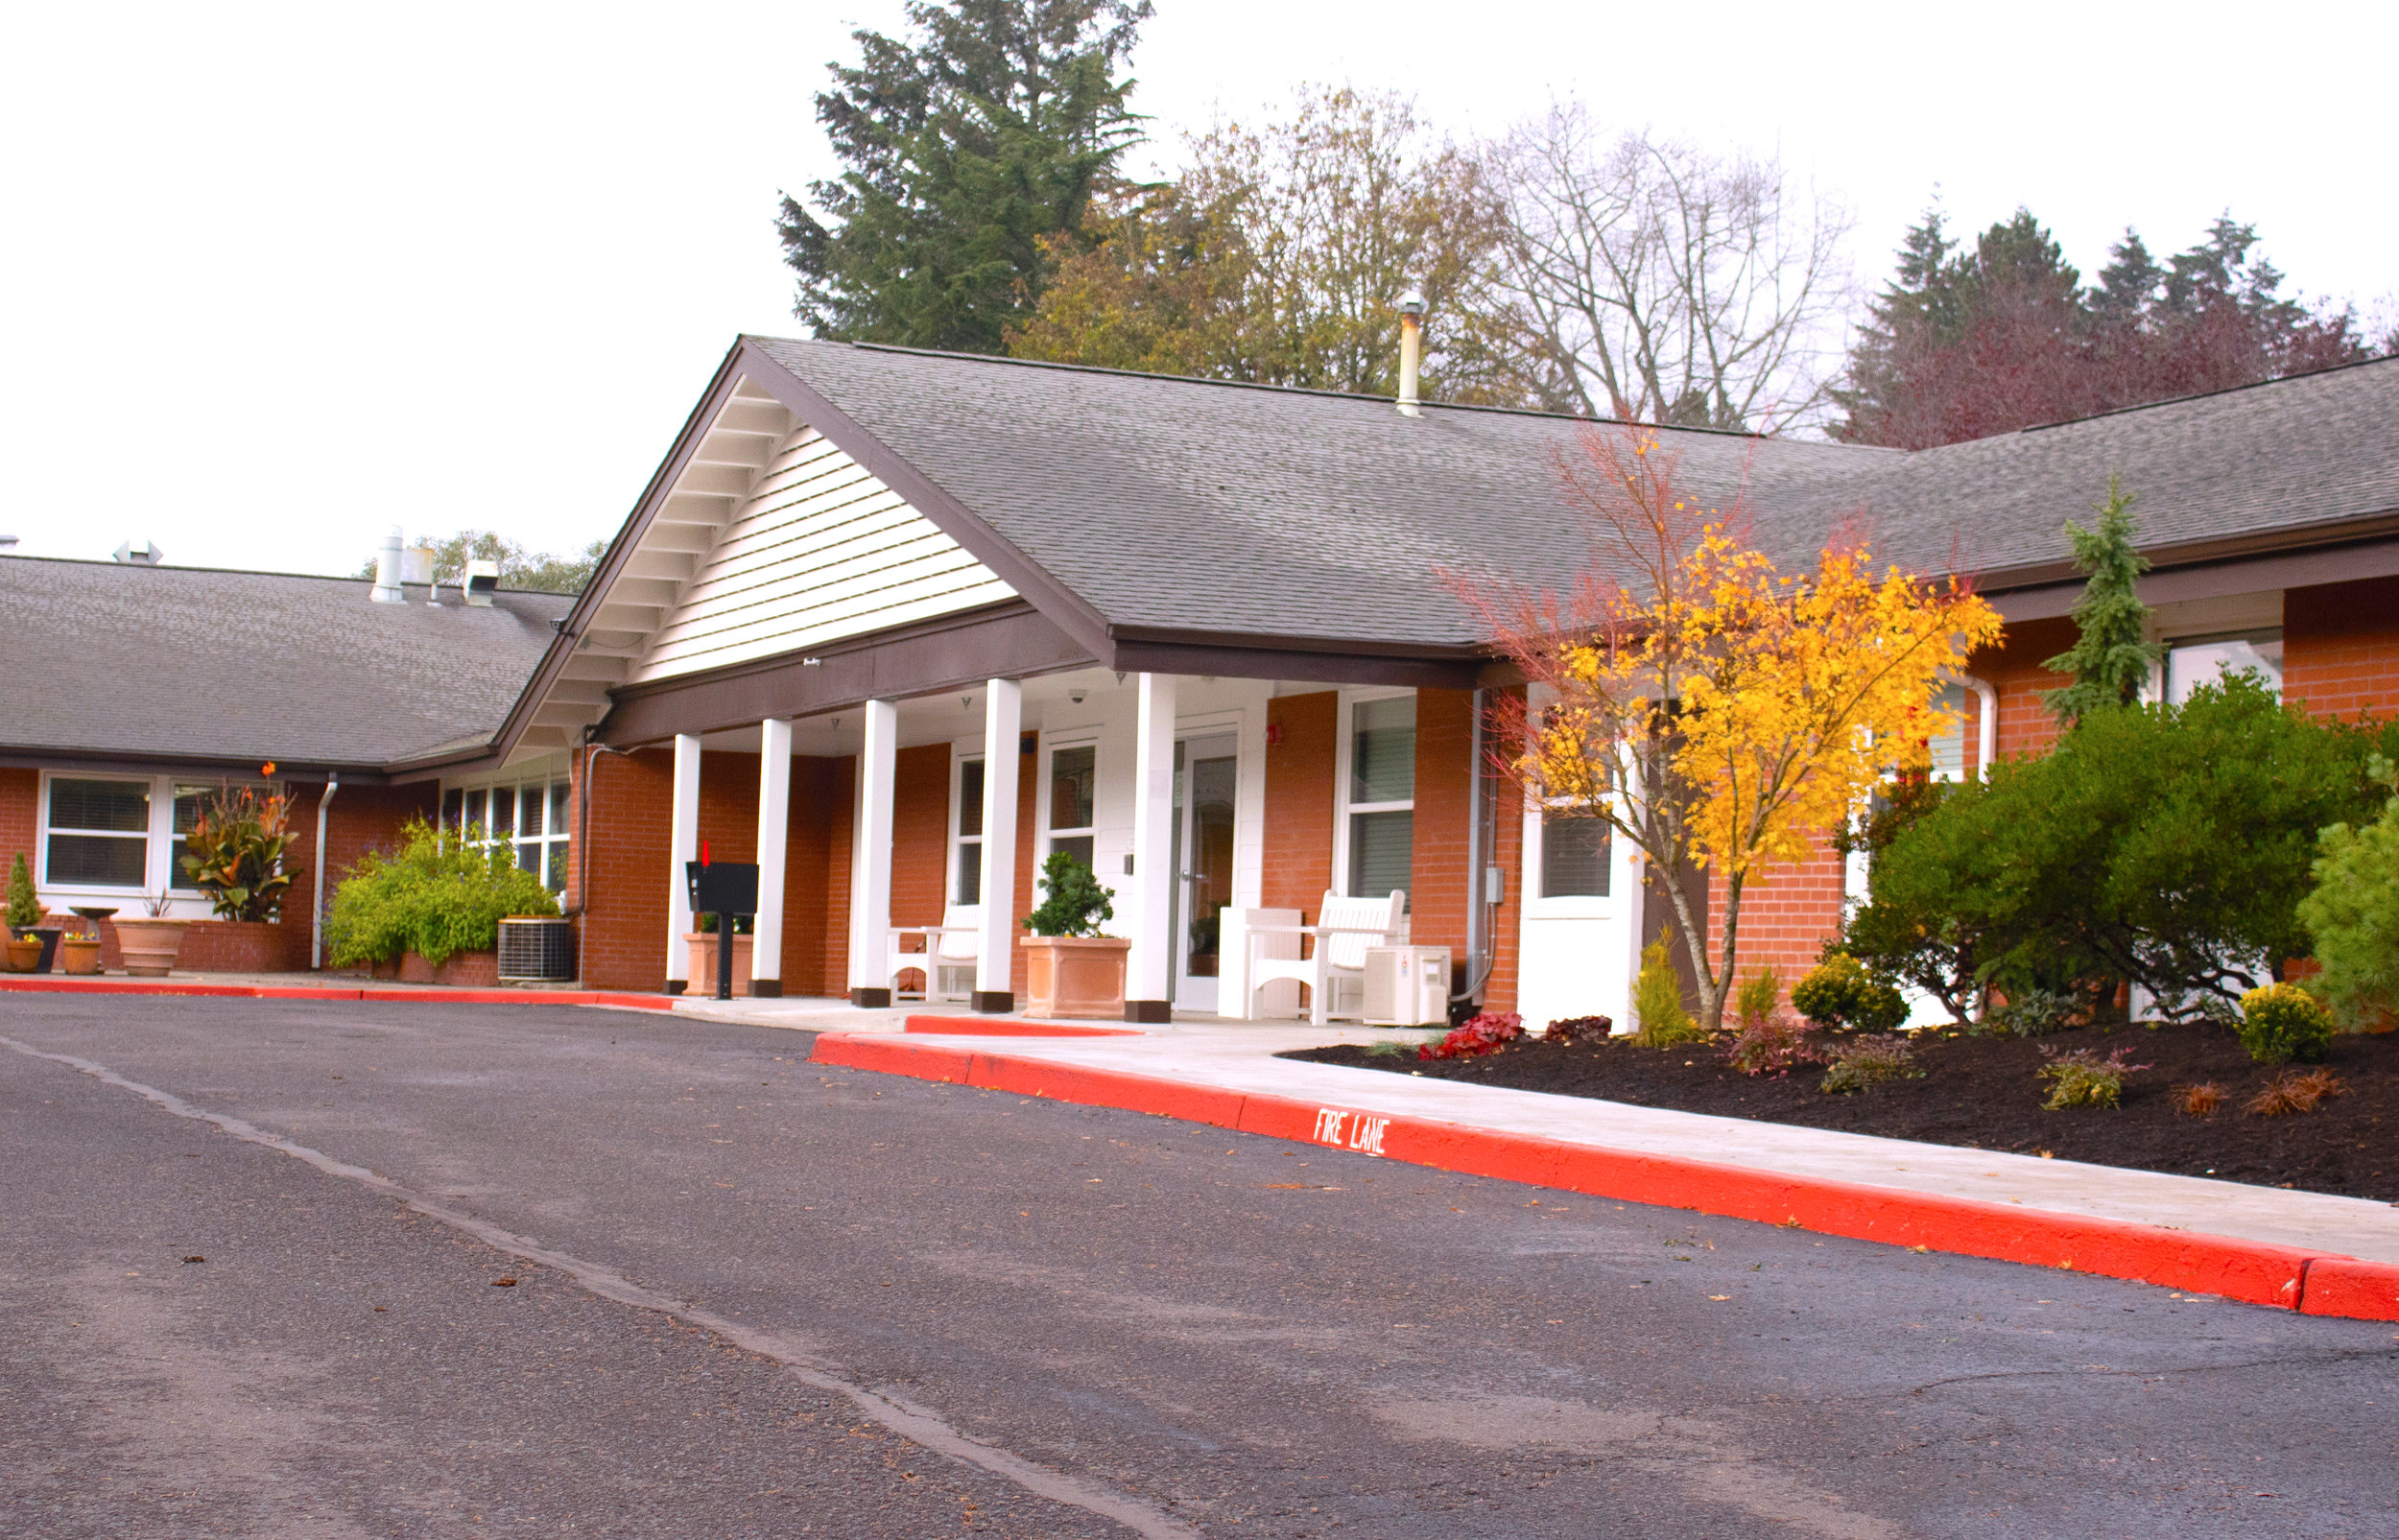 Village Health Care facility's main entrance